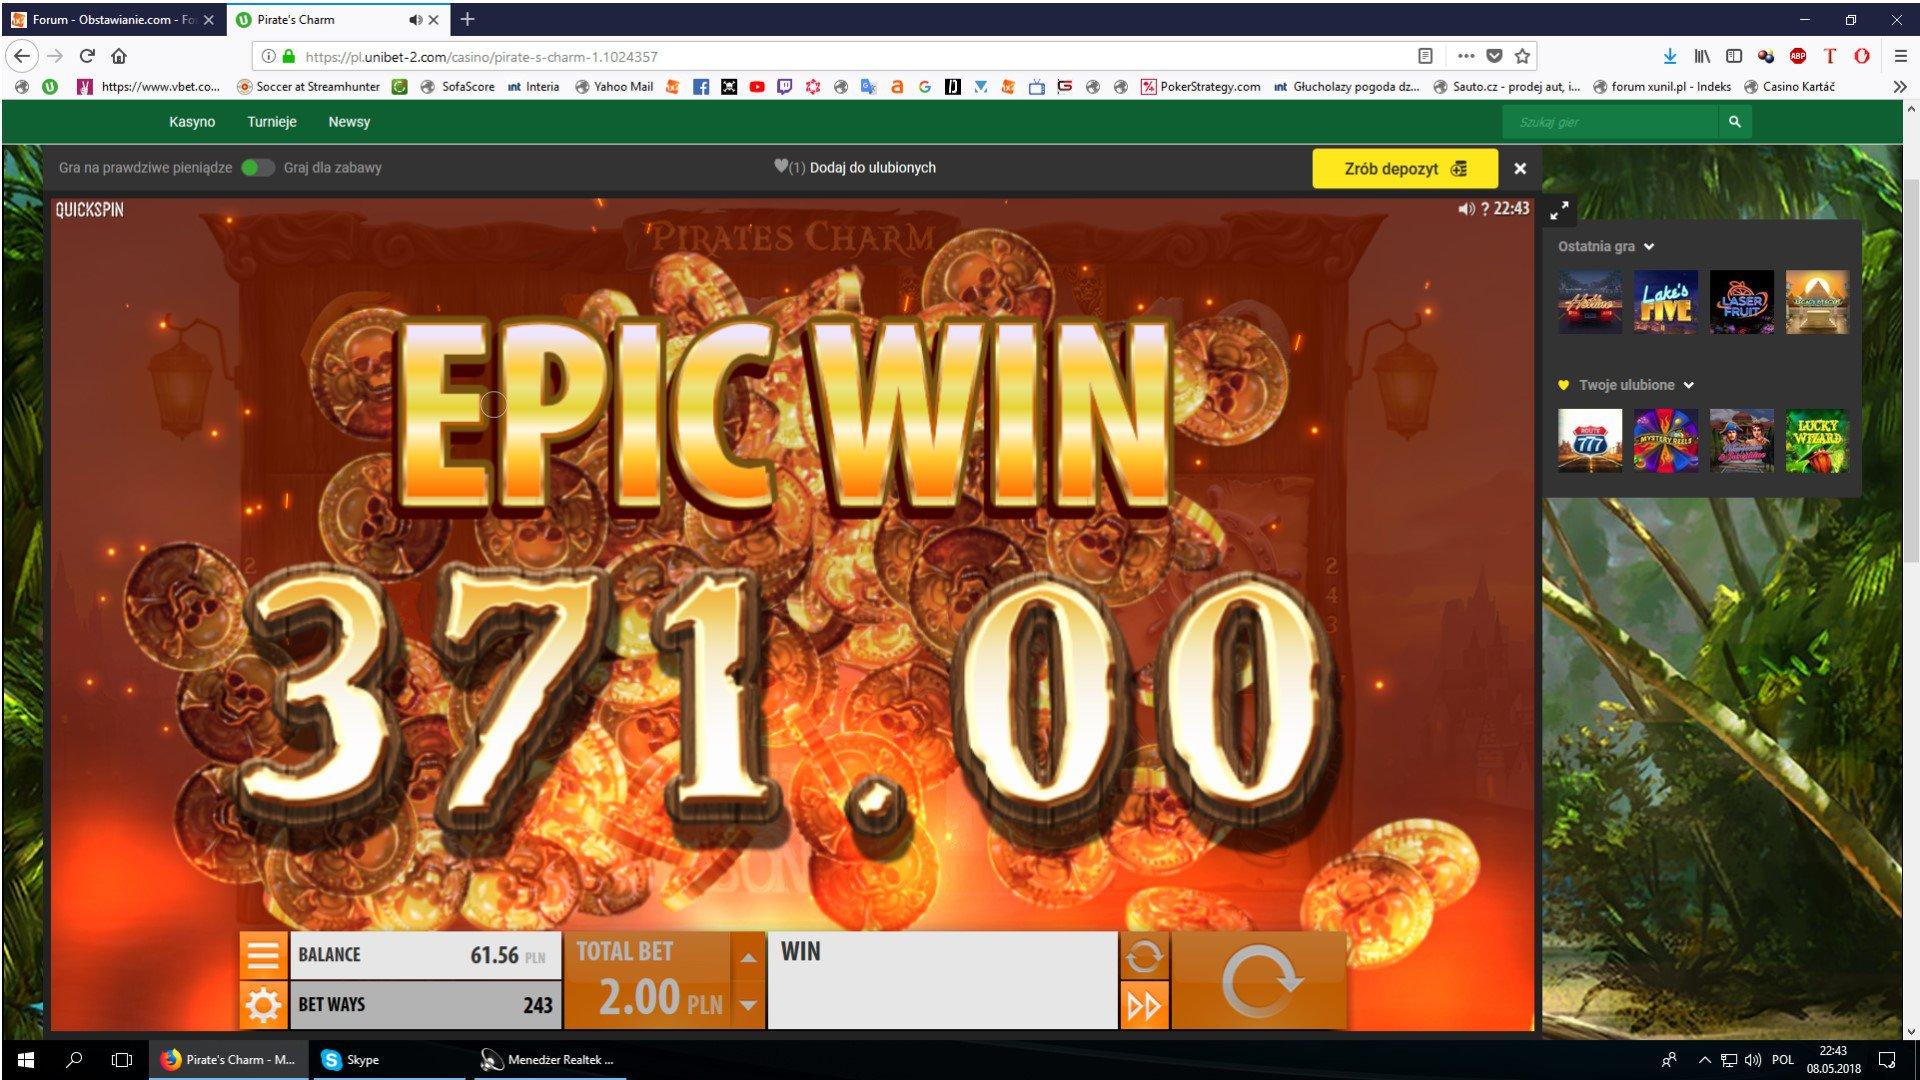 win.jpg.427b45440384a9e46c1a2ed4d1233015